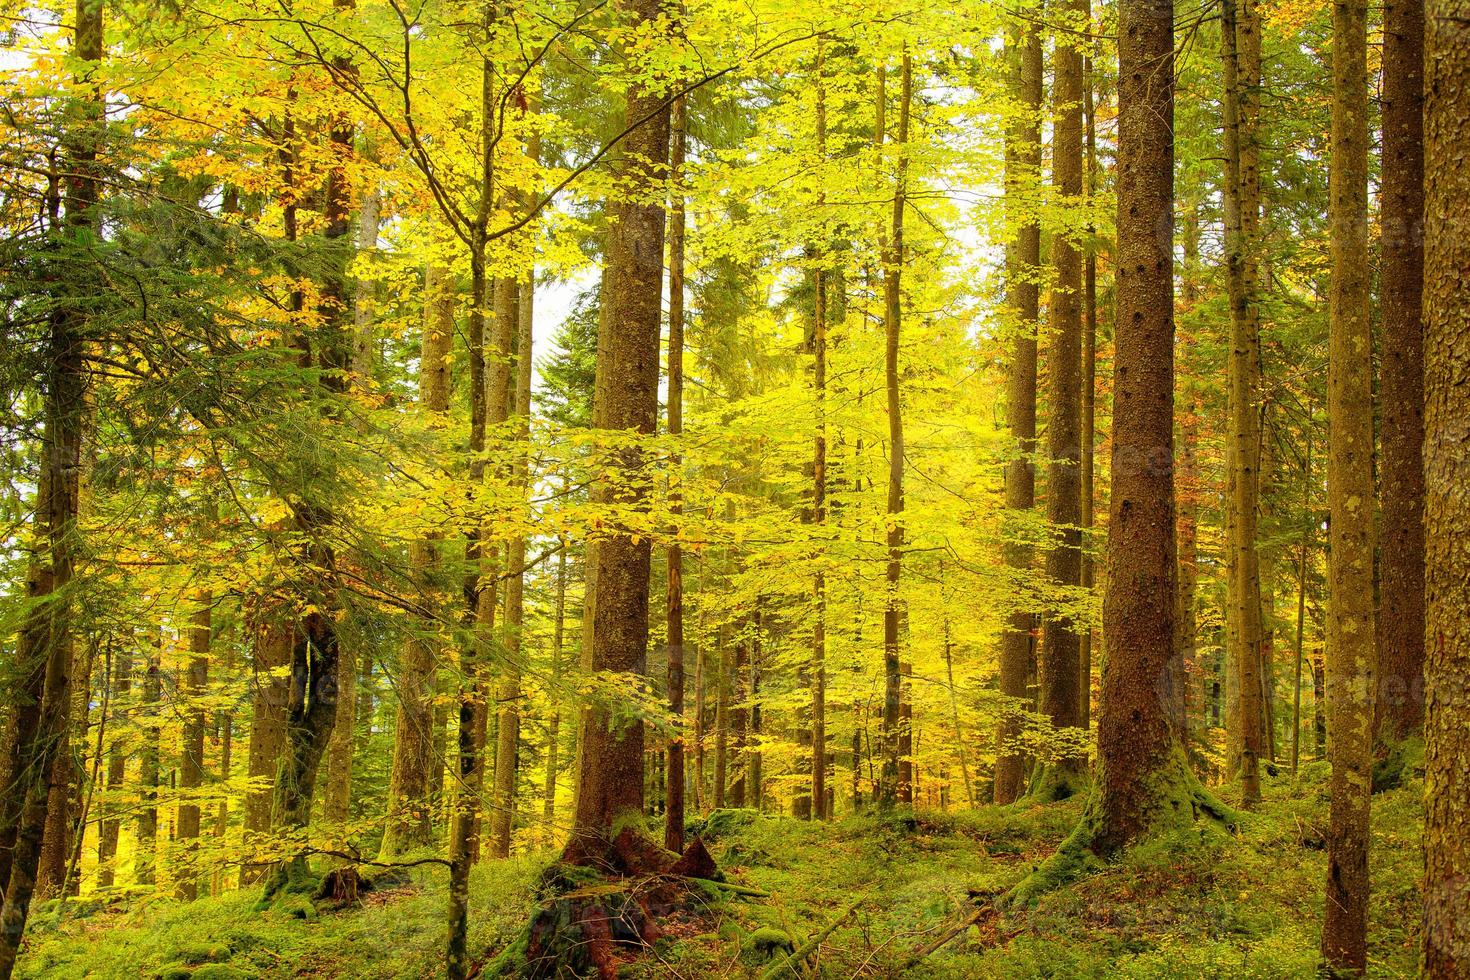 Golden autumnal forest photo